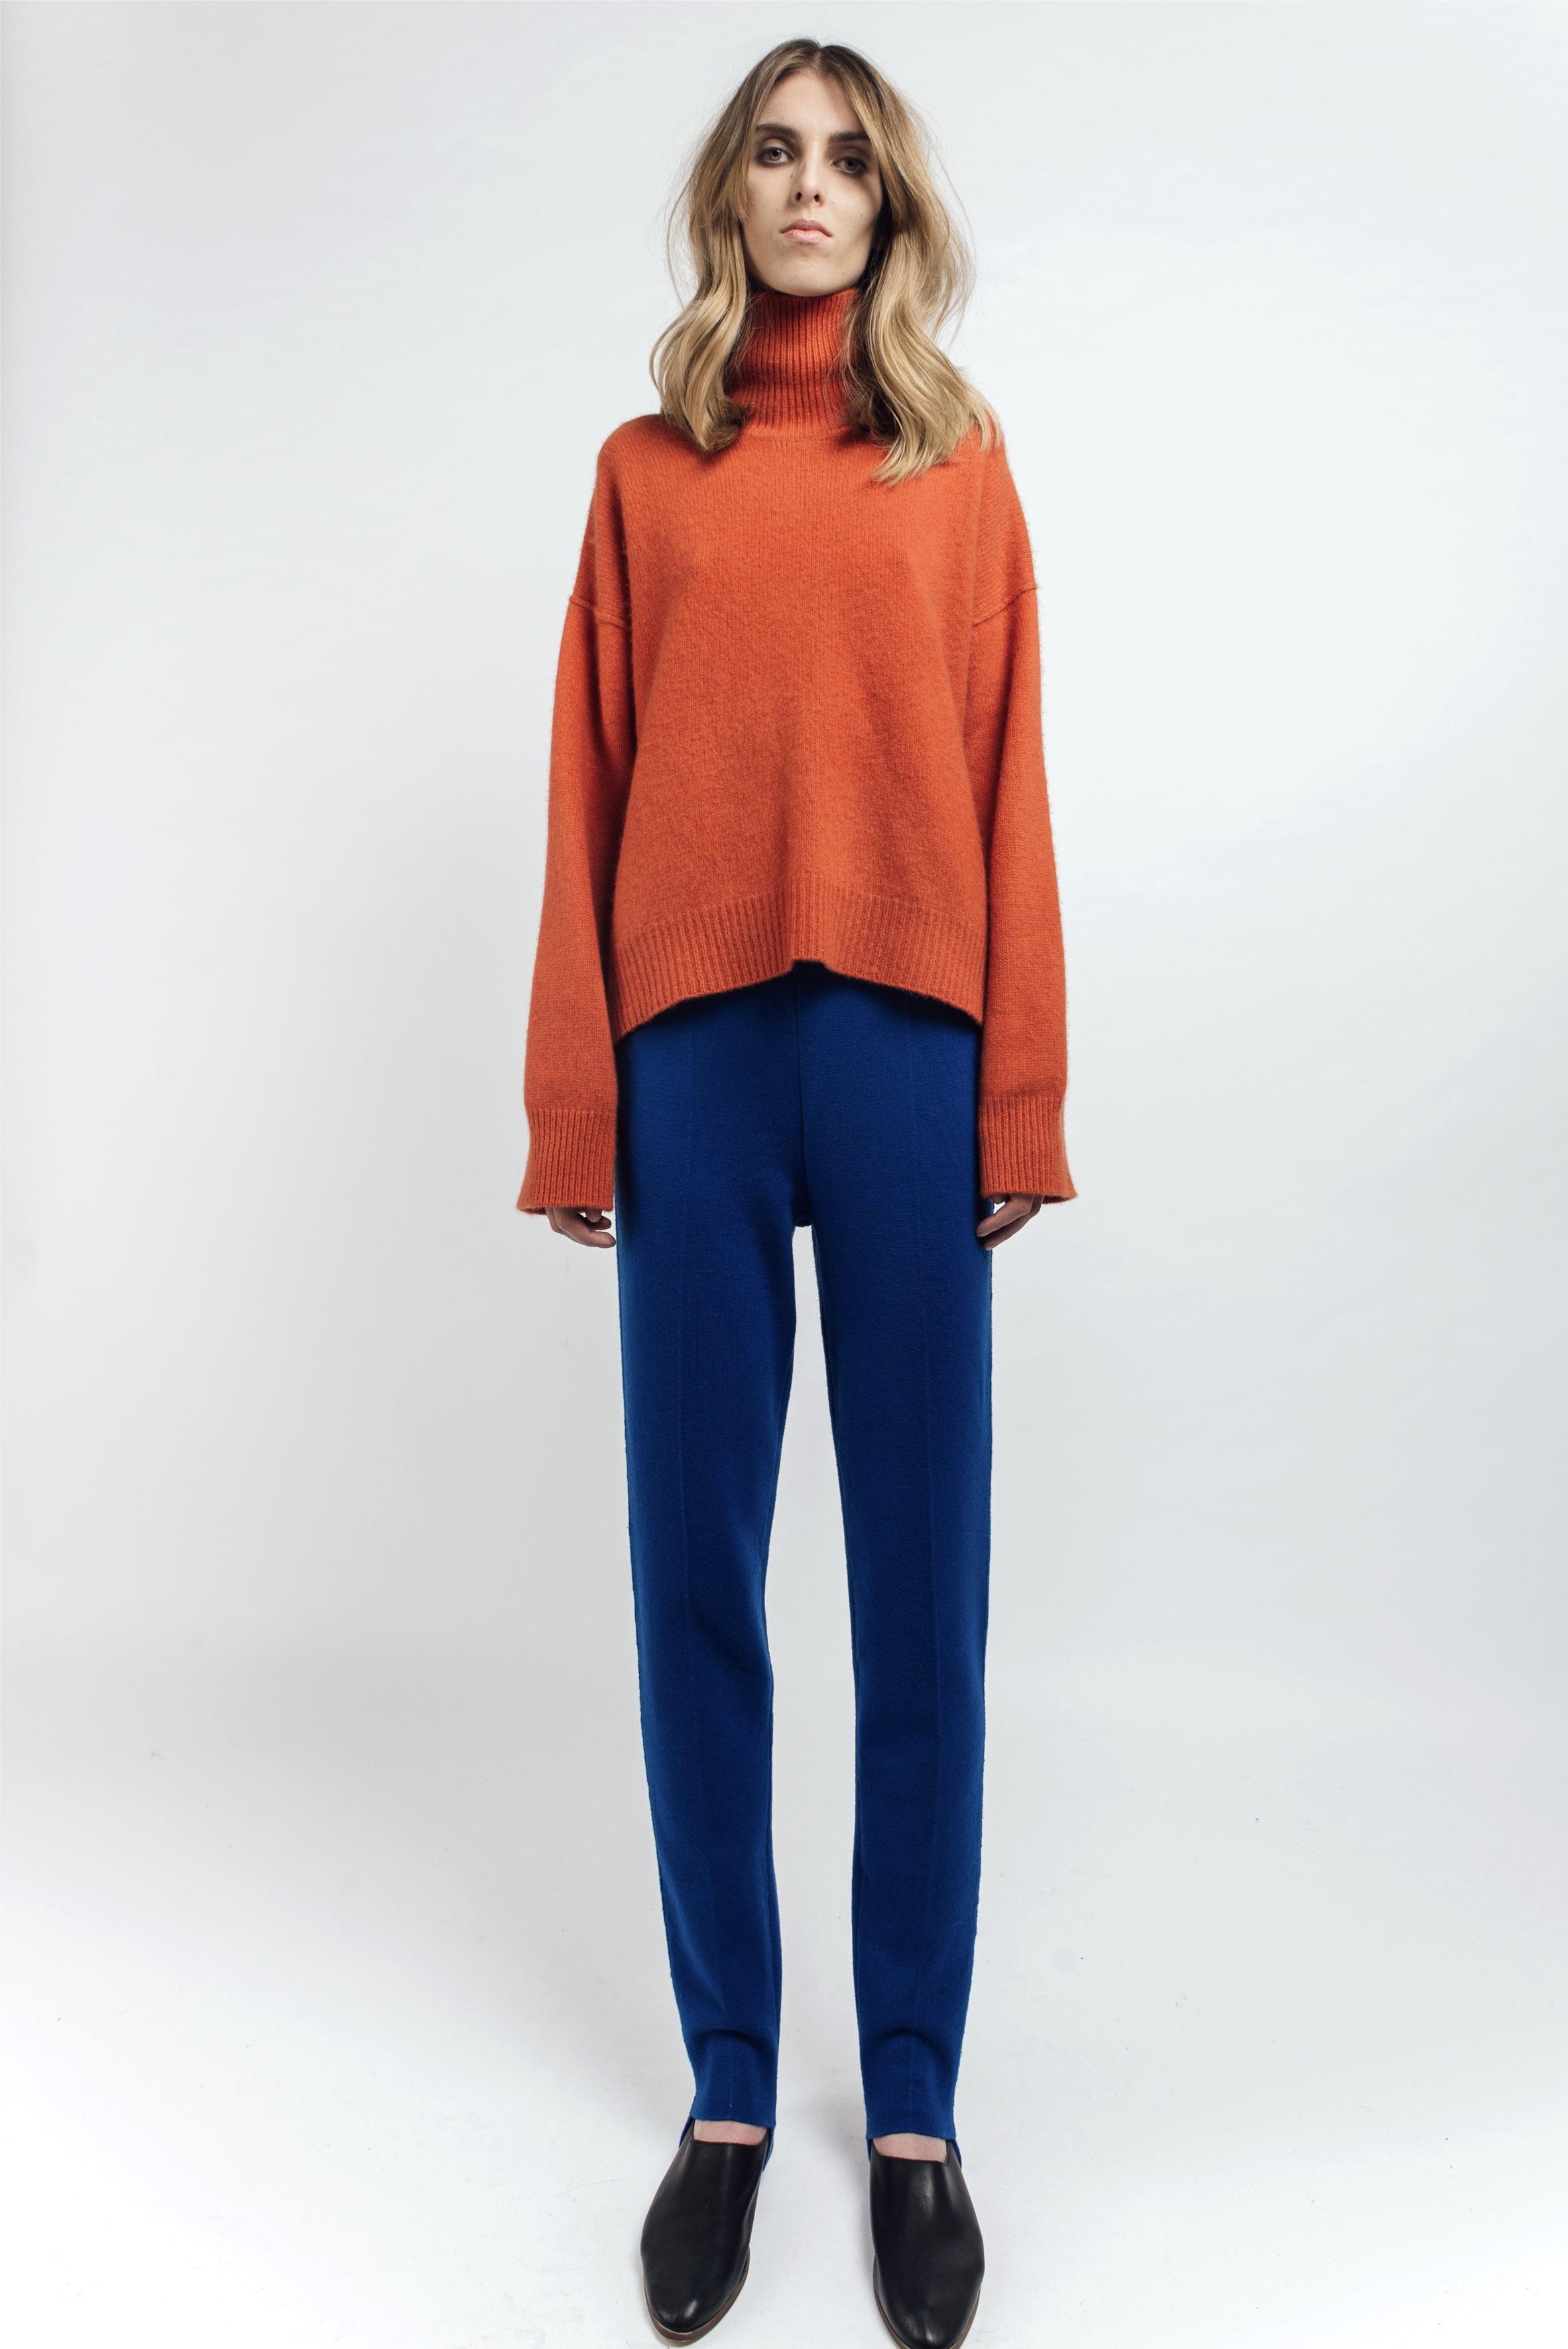 Oversized cashmere jumper in orange